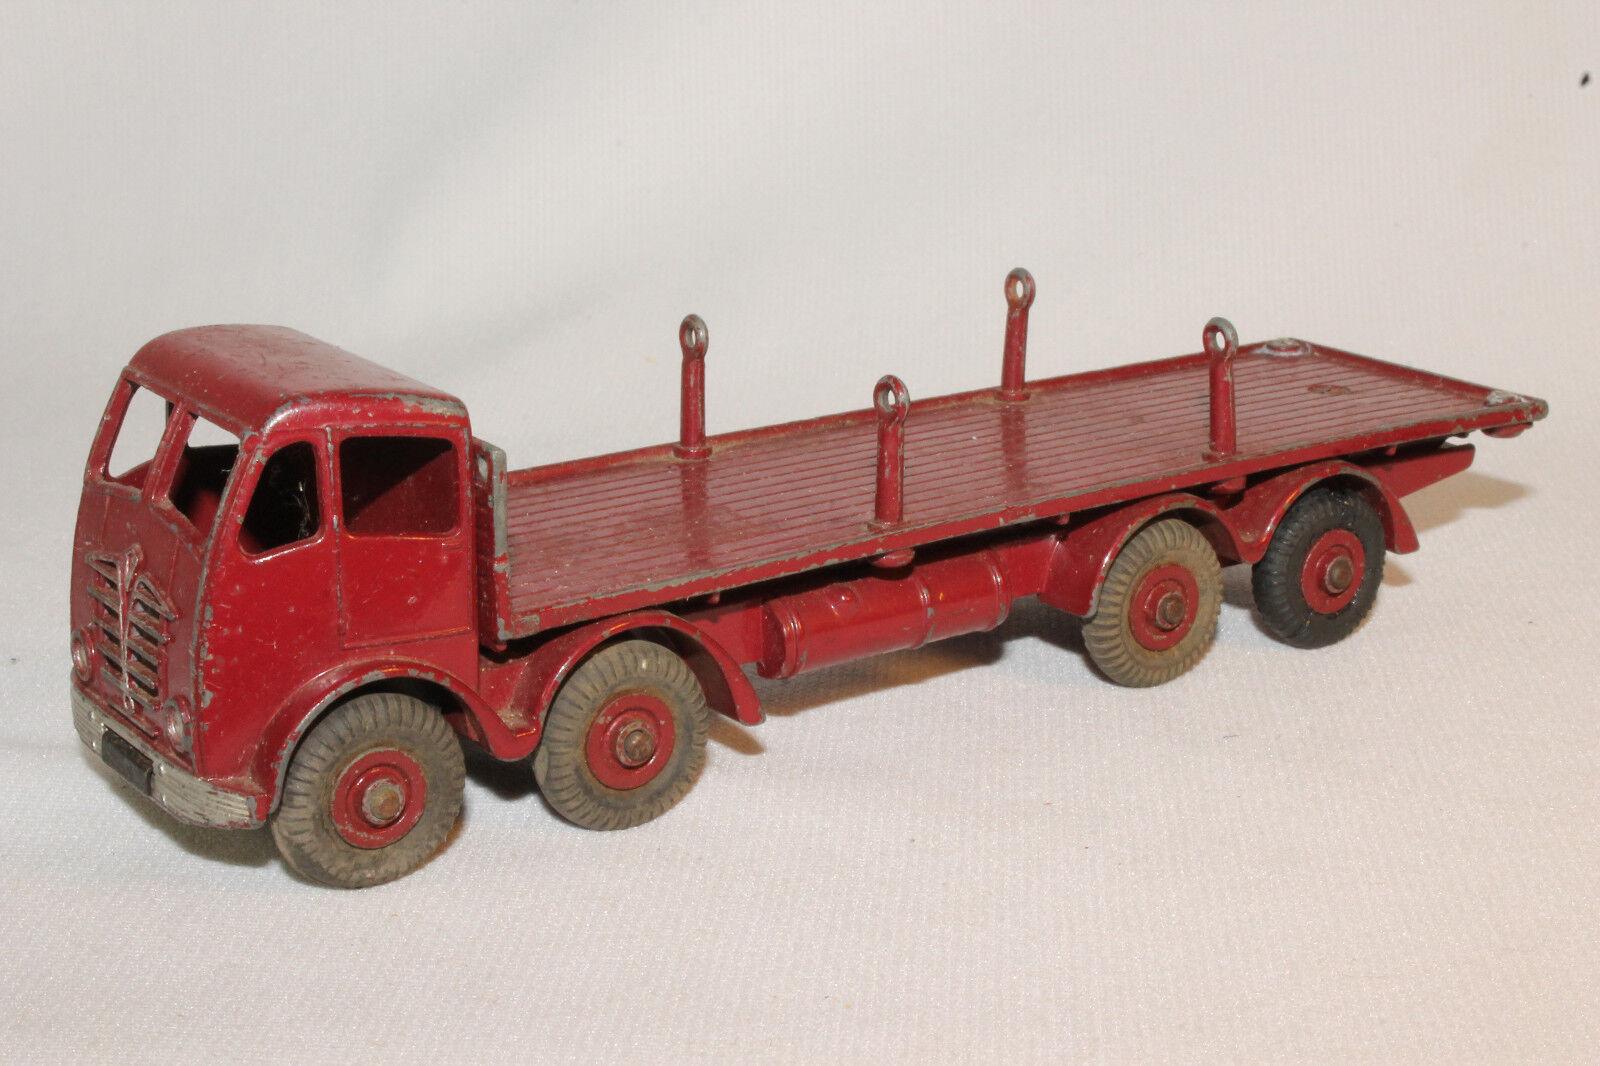 1950's Dinky_FodenTruck con Chains, Maroon rosso, Originale